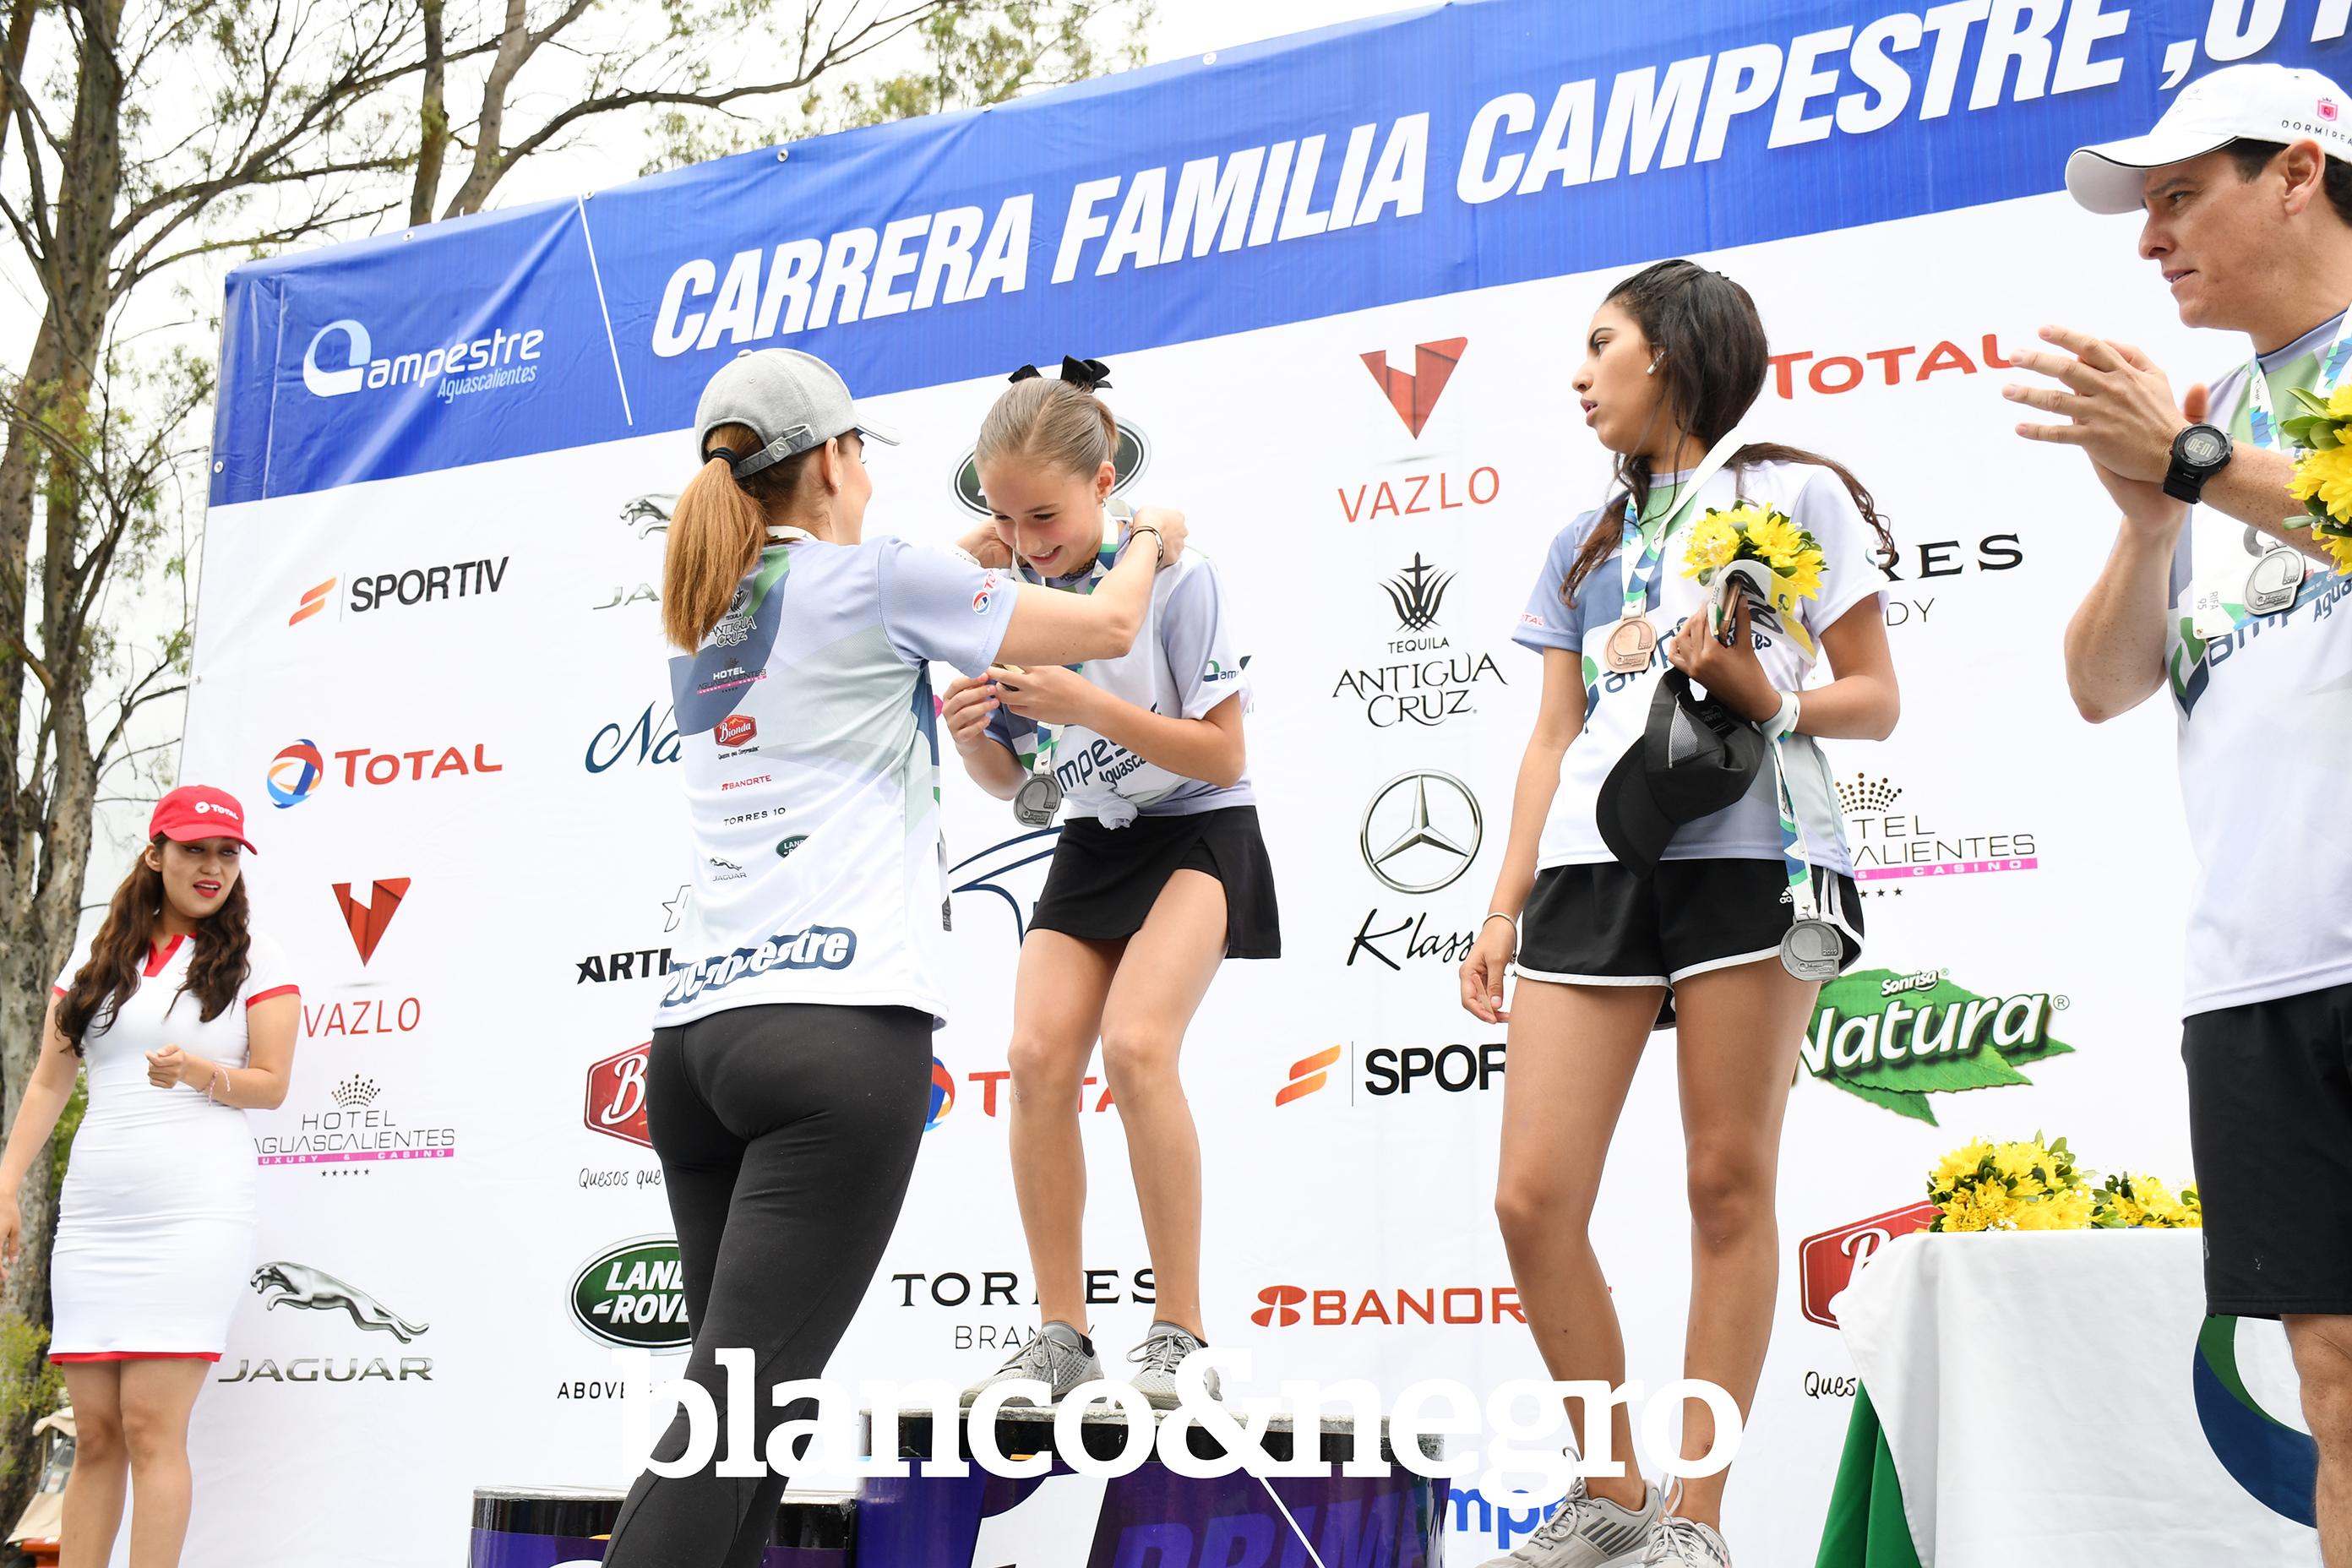 Carrera Campestre 374